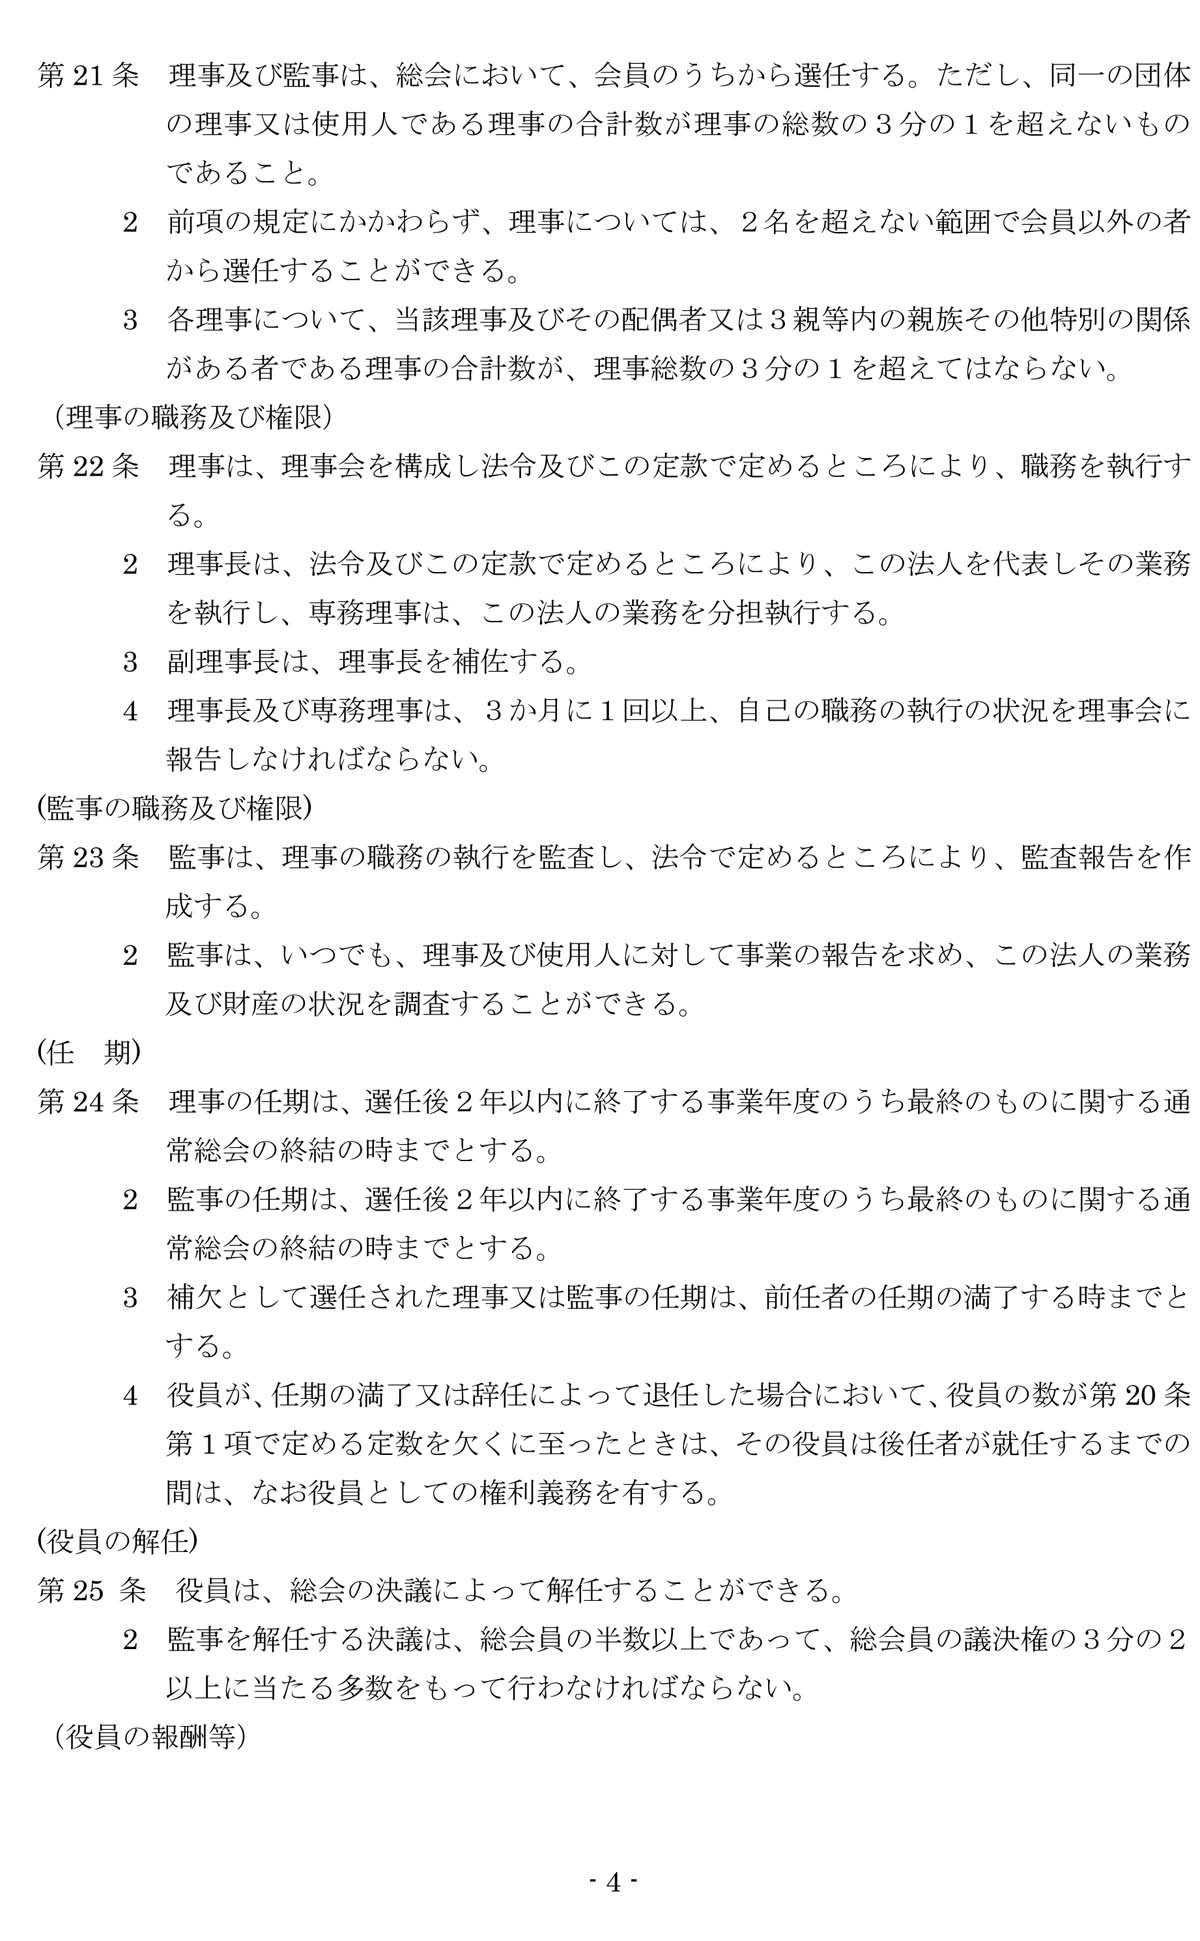 定款4(栃木県労働者福祉センター)